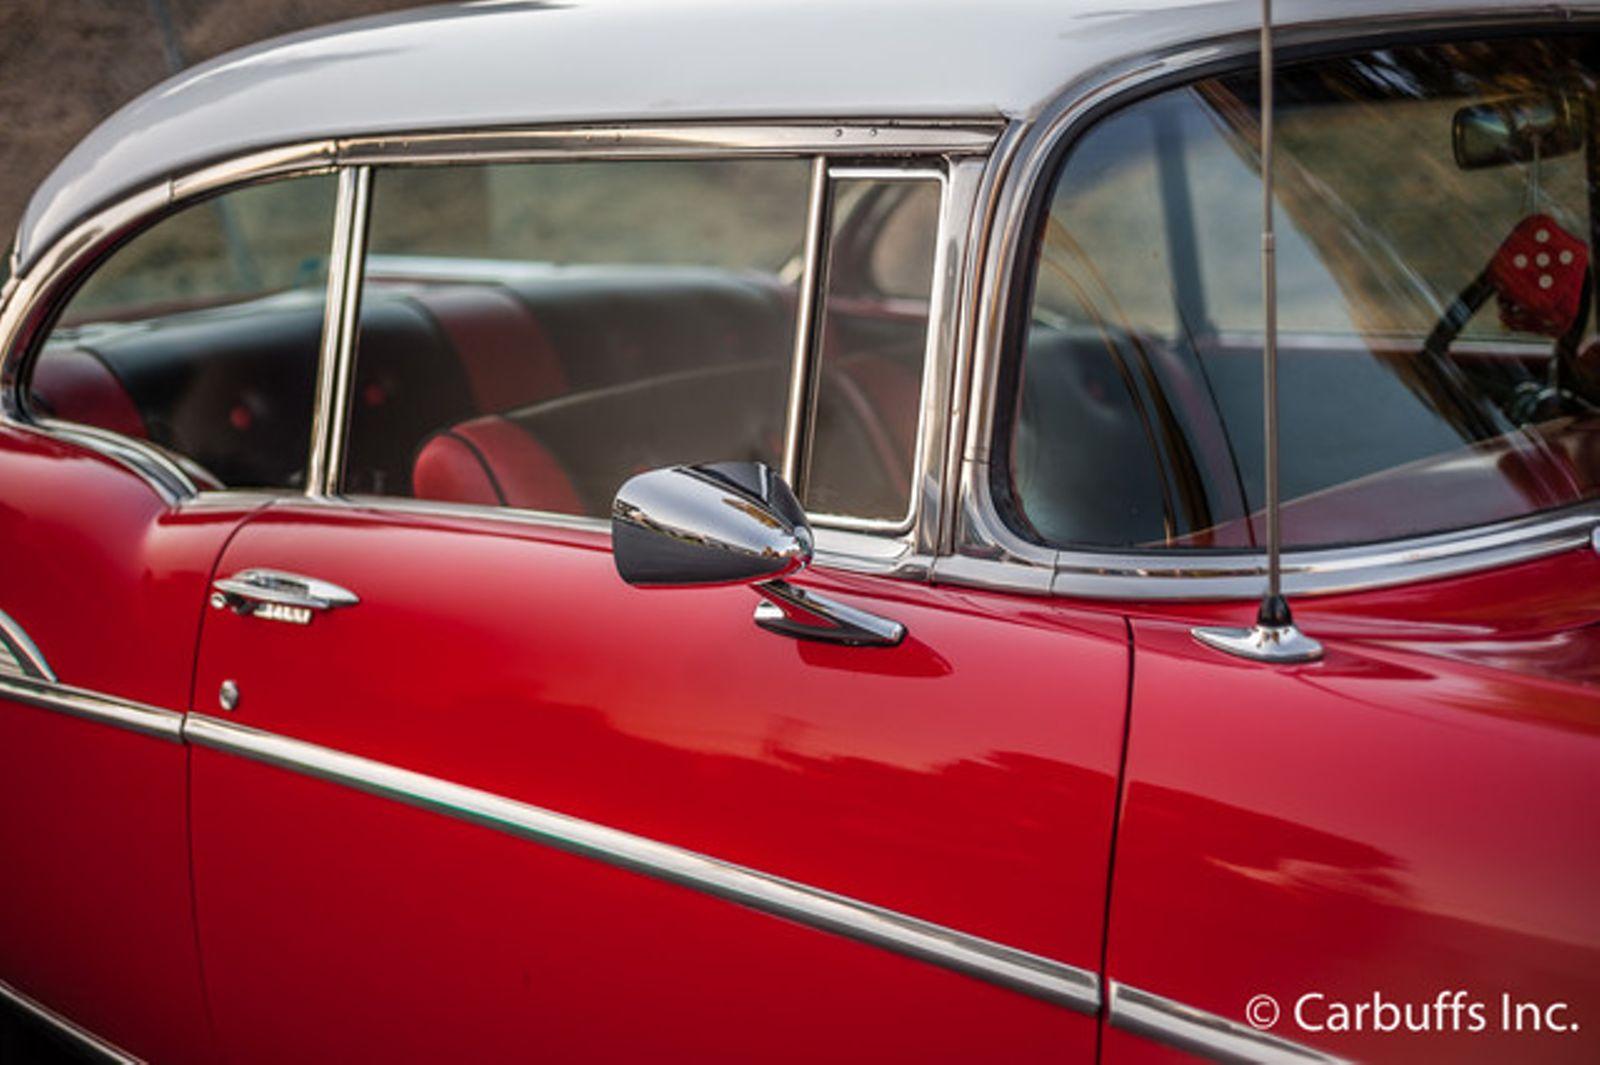 1957 Chevrolet Belair 2dr Concord Ca Carbuffs 94520 Sales Brochure In